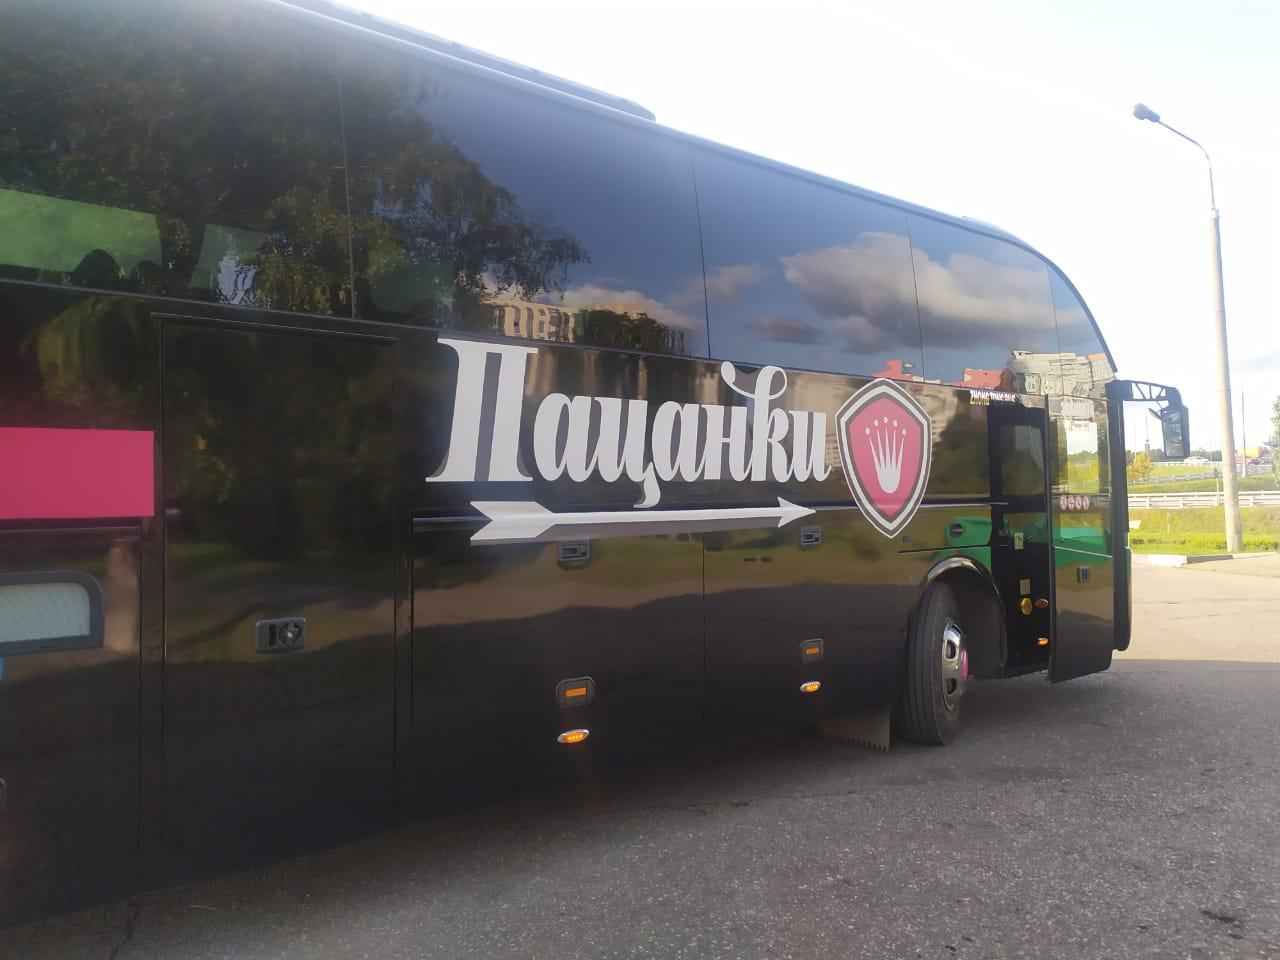 llktFG9YvjA - Автобус ТК «Аллегро» на канале «Пятница»